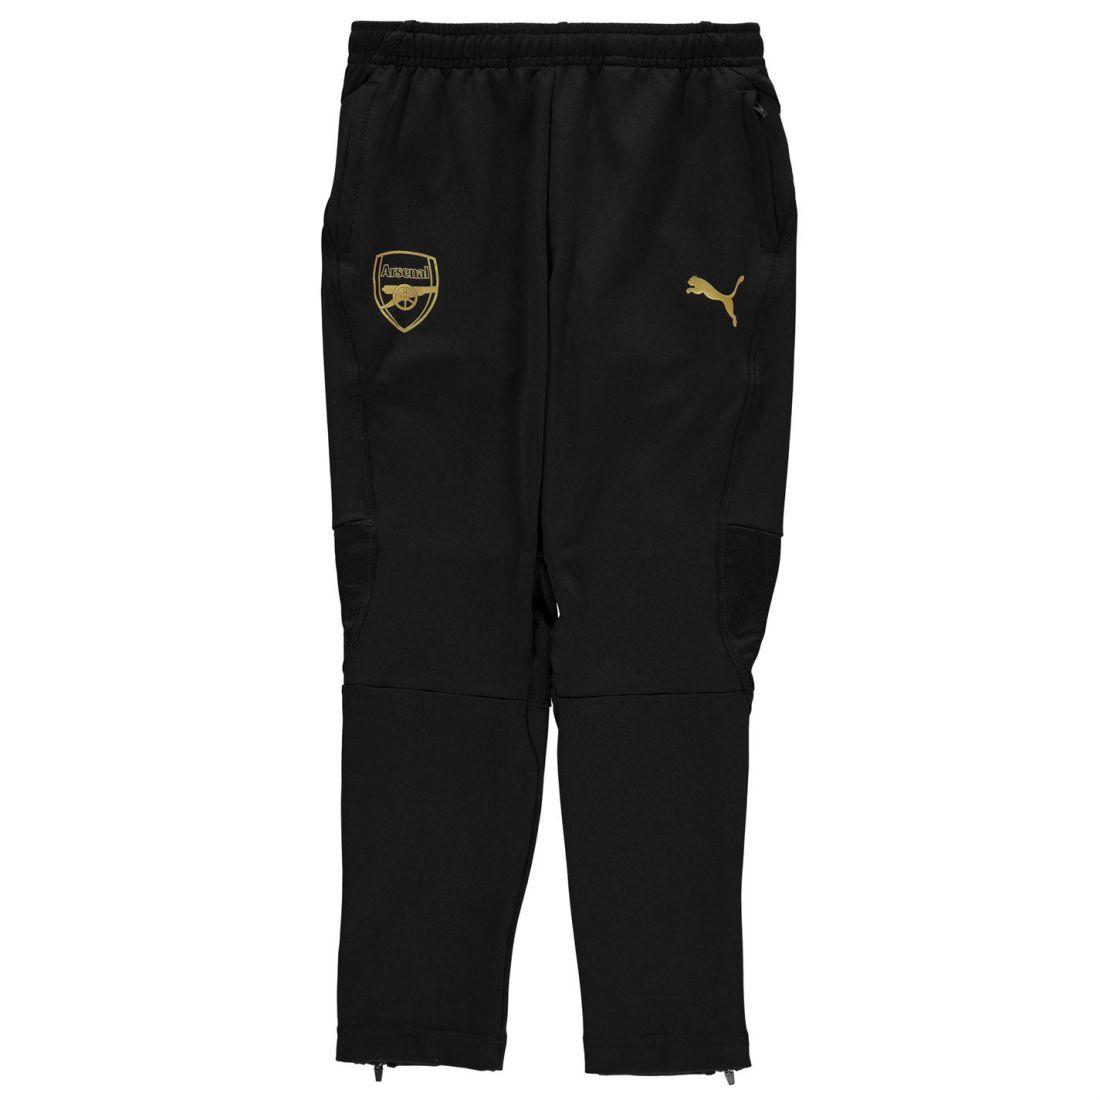 adad8a5d1b3 Details about Puma Kids Arsenal Training Pants 2018 2019 Junior Performance  Tracksuit Bottoms